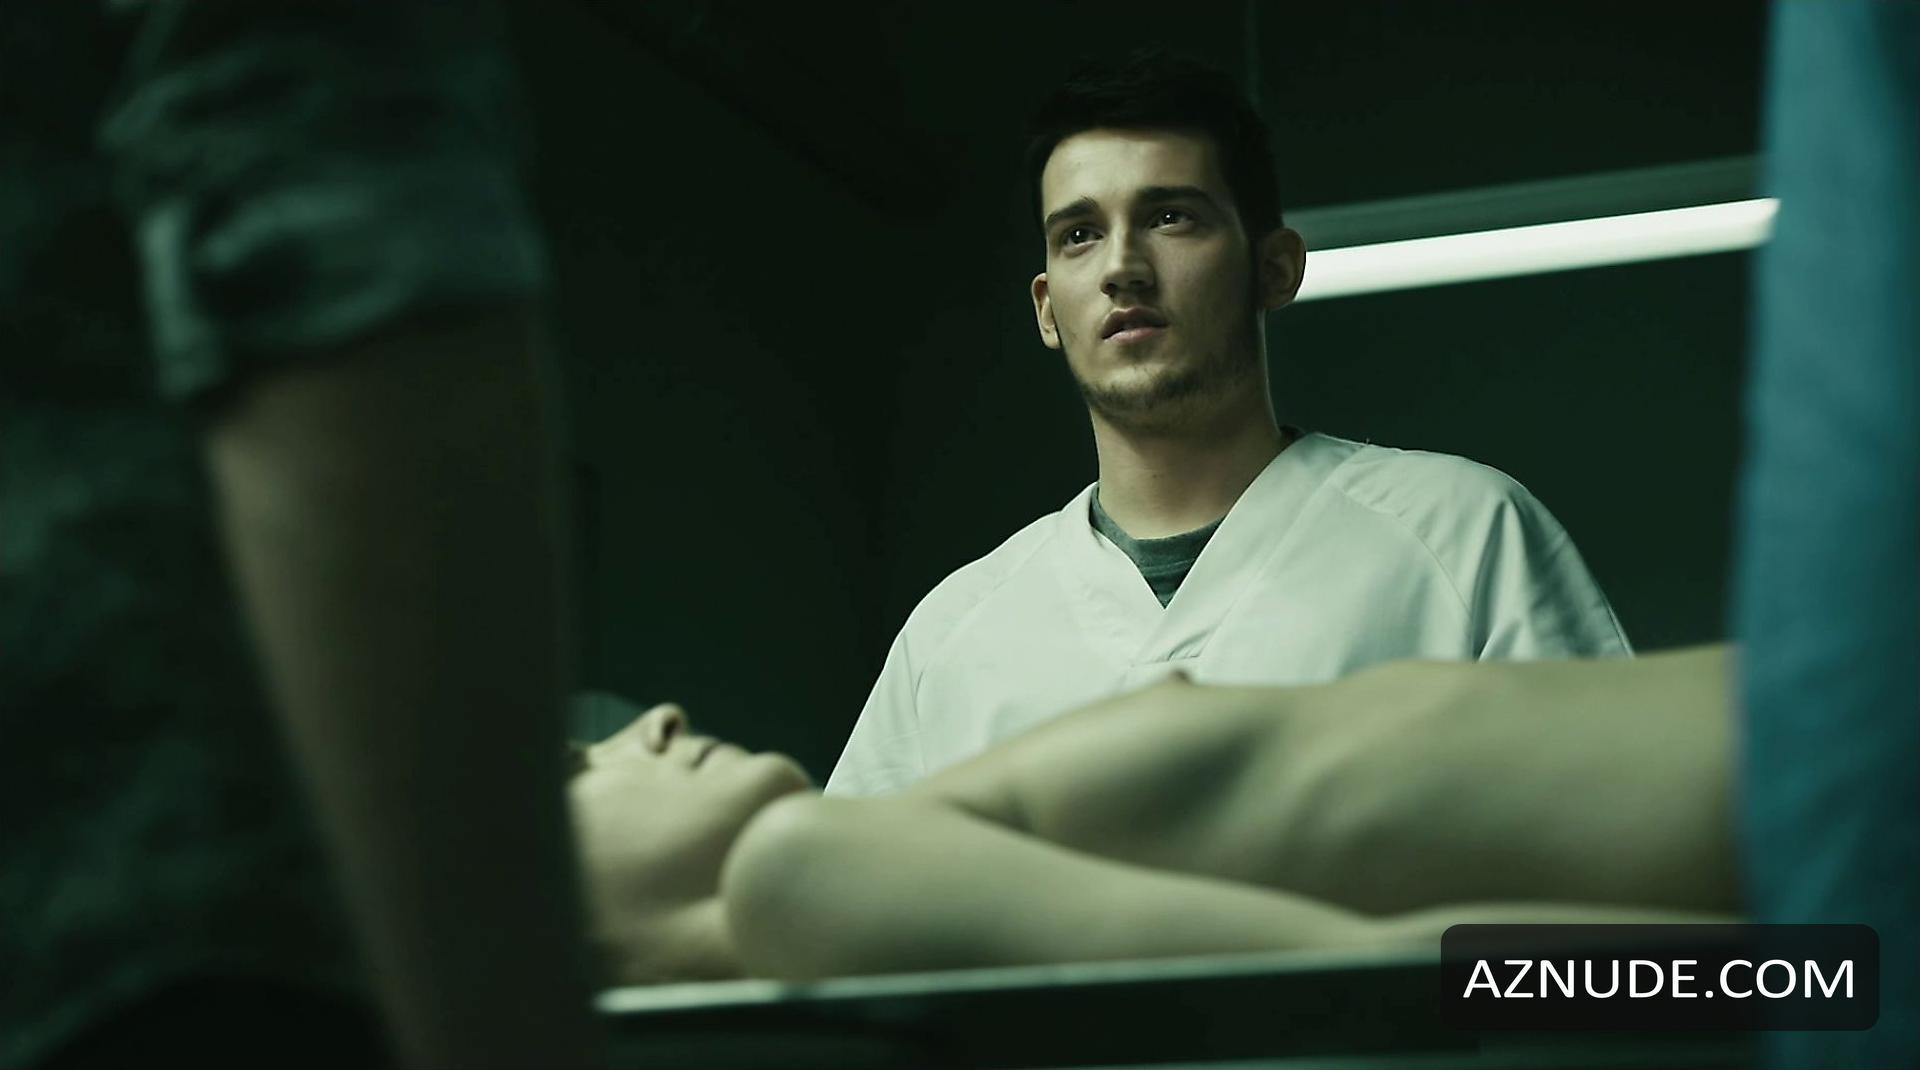 Alba ribas nude sex scene in diario de una ninfomana movie 4